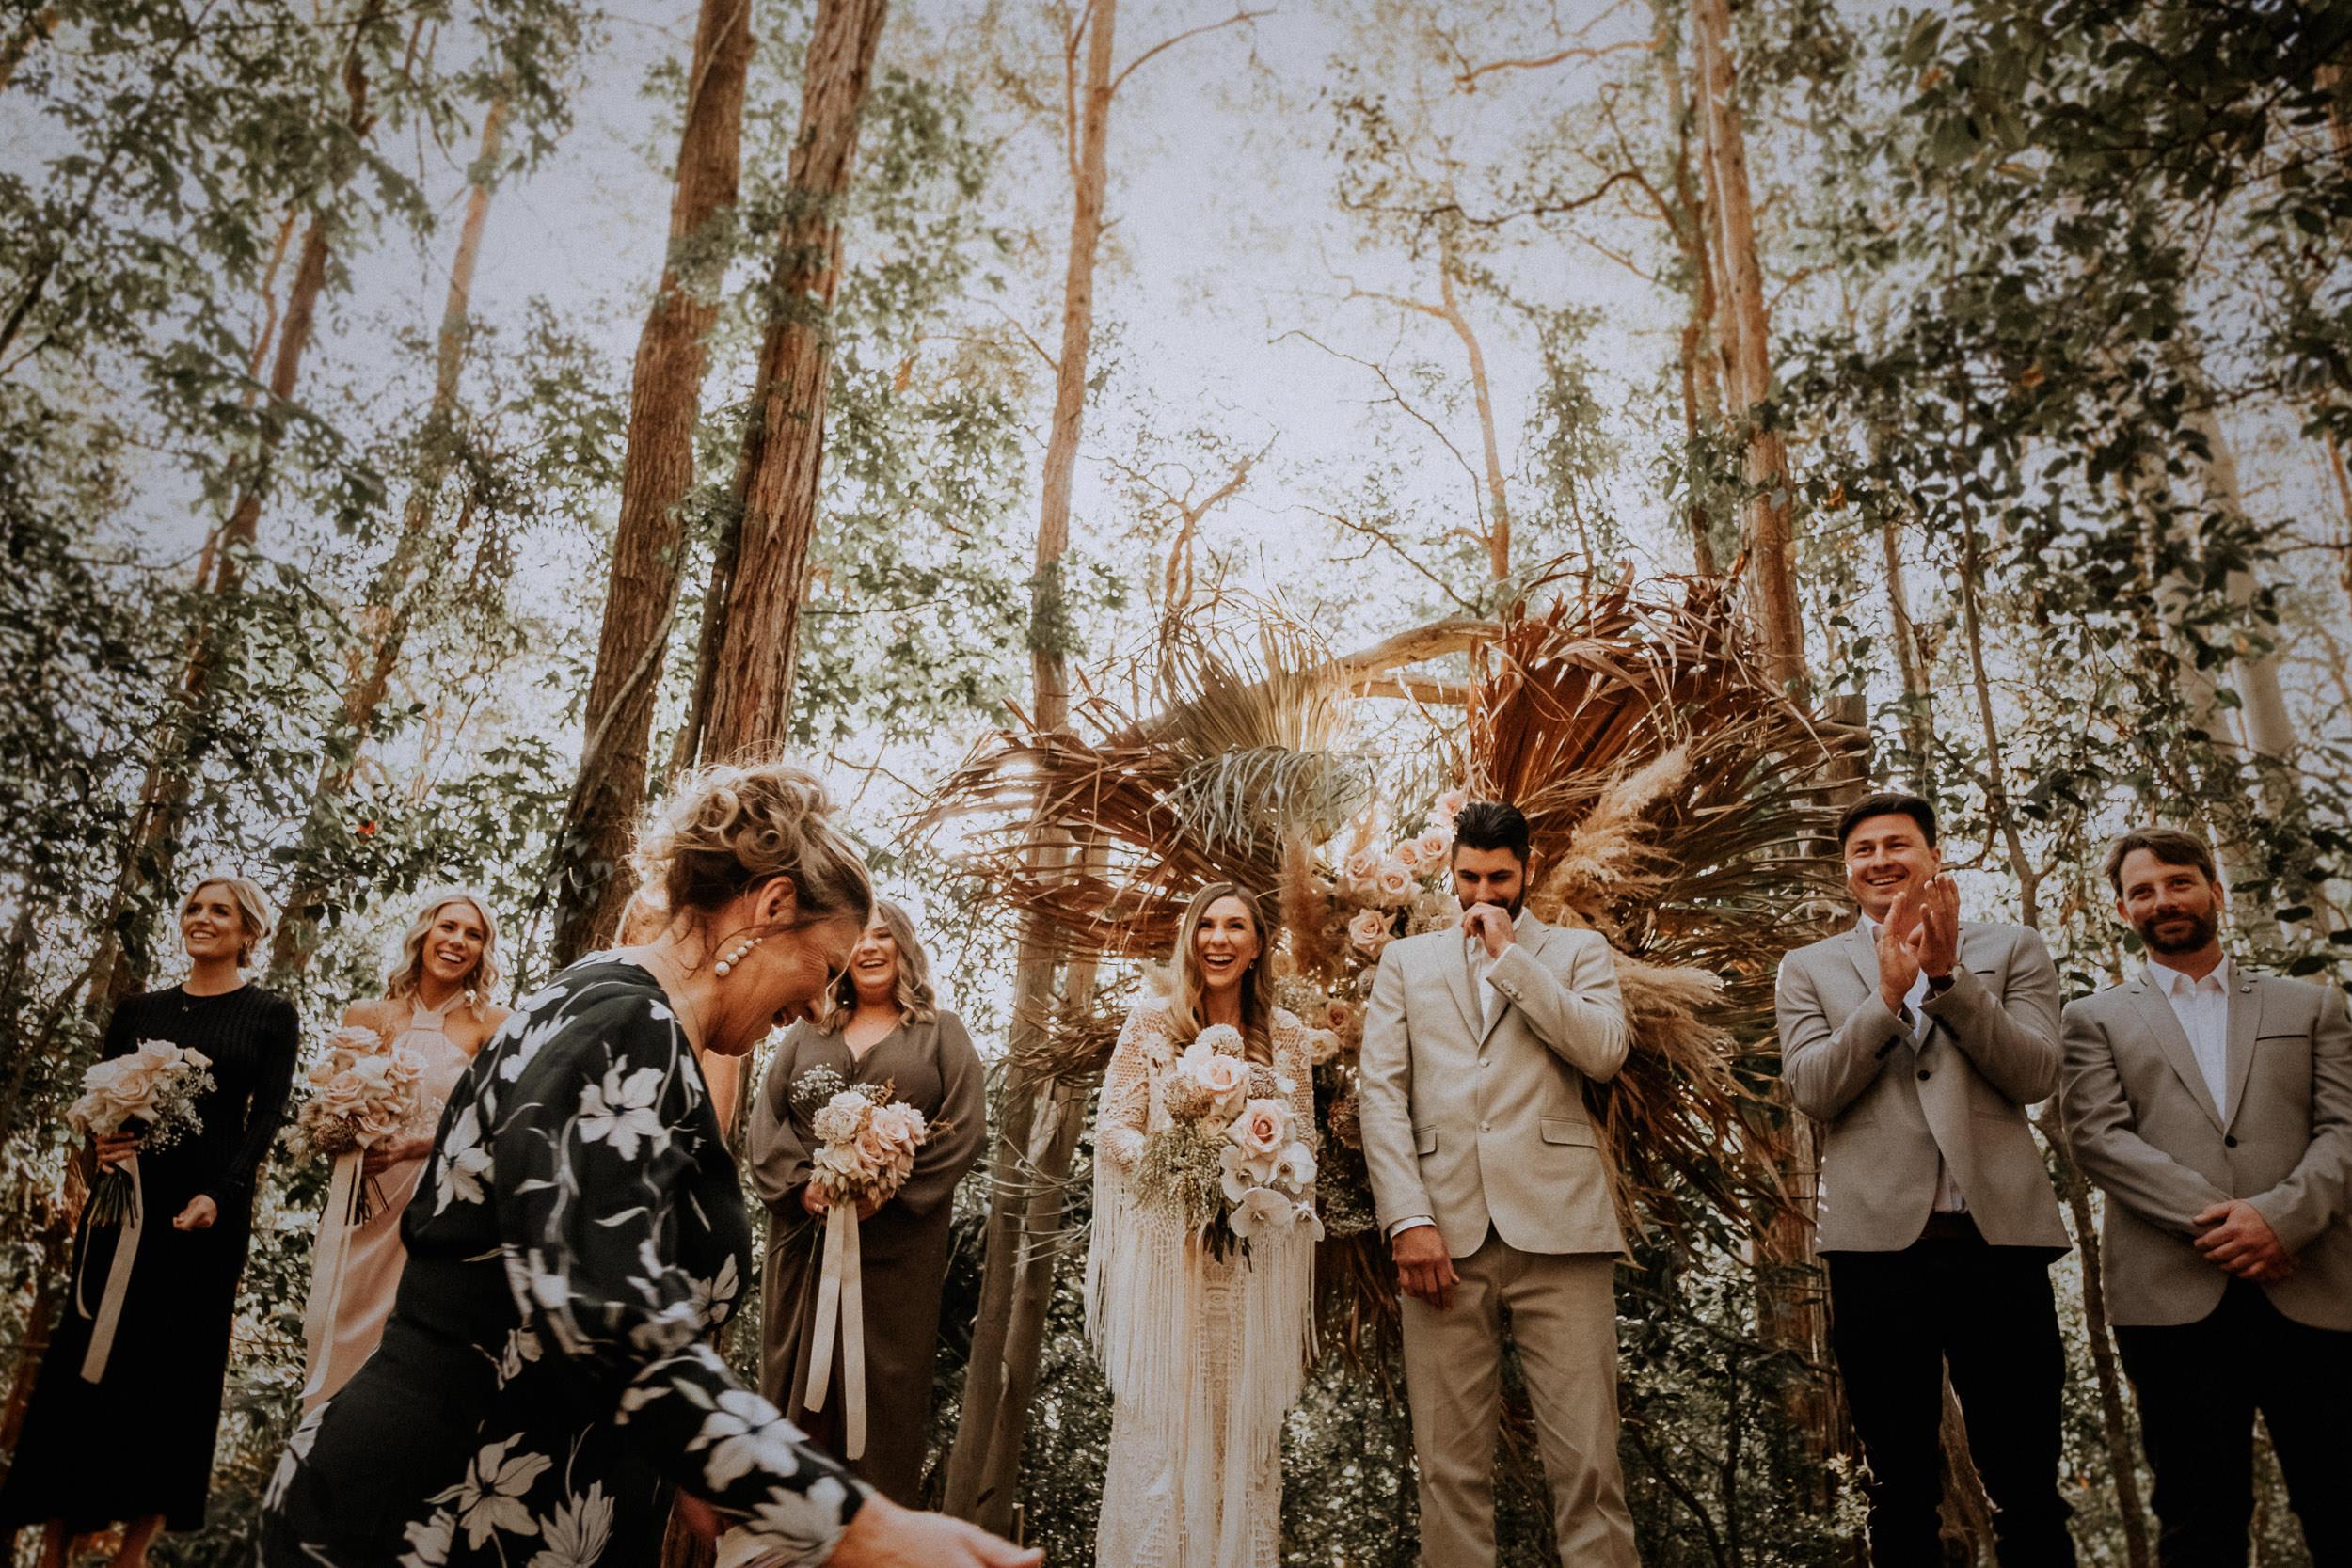 S&A Elopement - Kings & Thieves - Shred 'Til Dead - Central Coast Beach Forest Wedding - 201.jpg